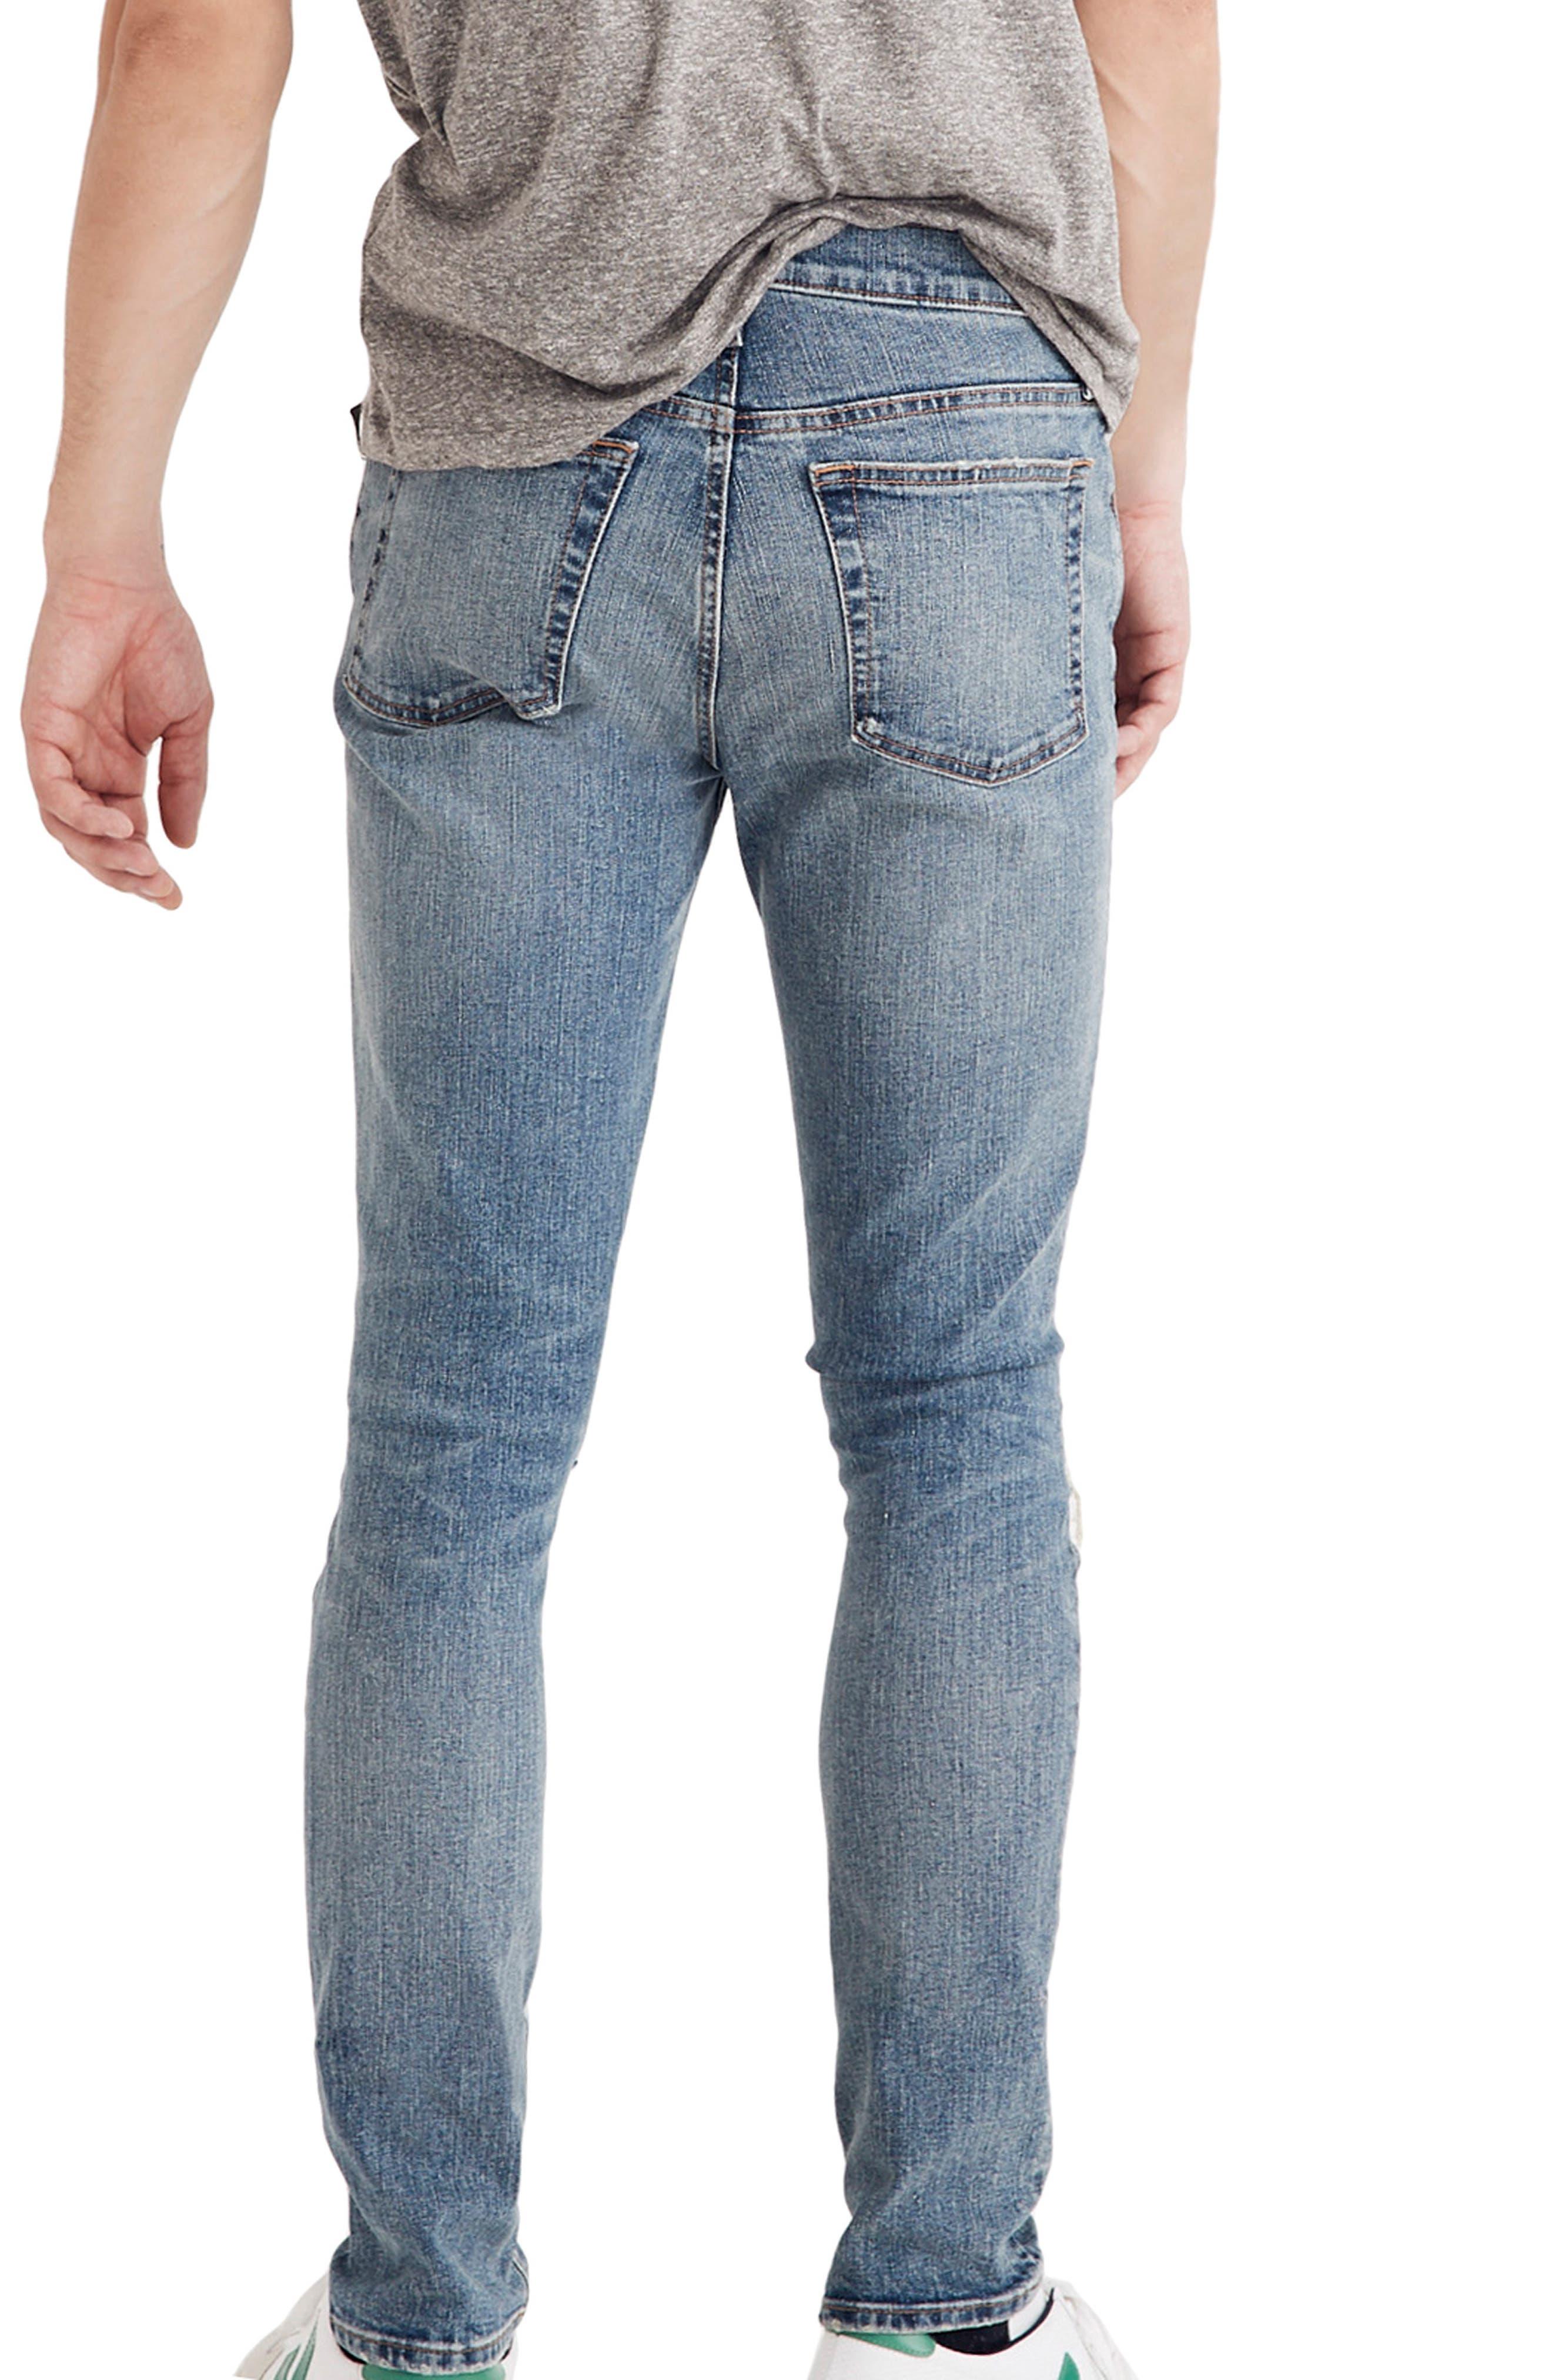 Skinny Fit Jeans,                             Alternate thumbnail 2, color,                             VINTAGE LIGHT